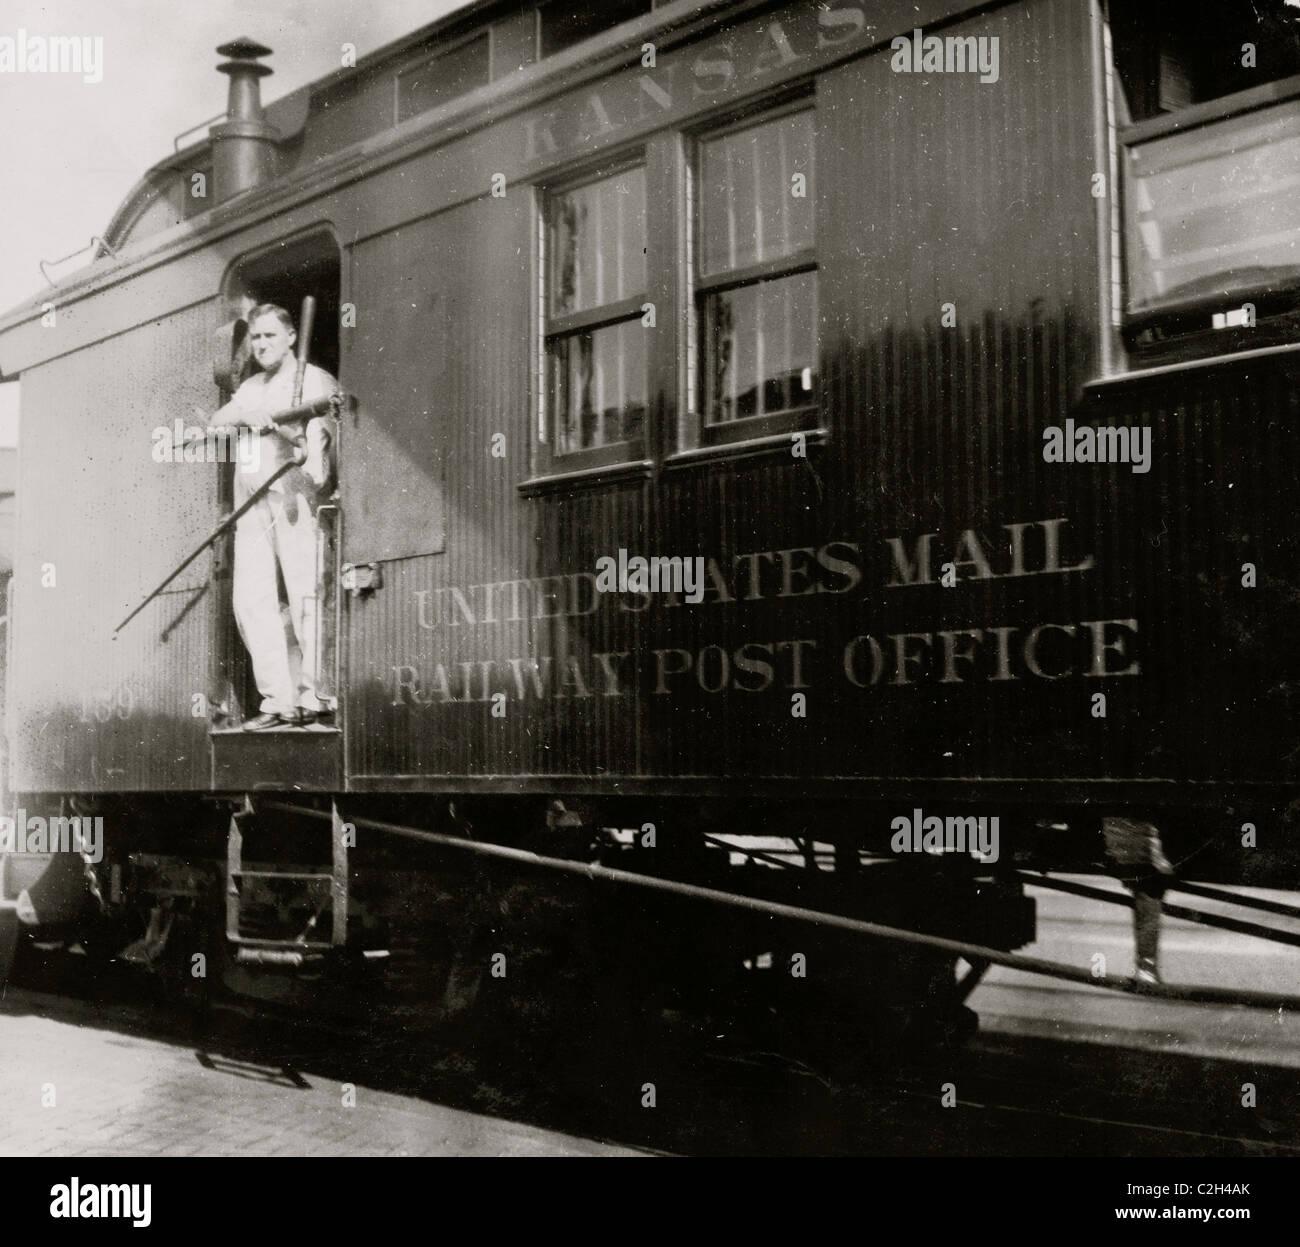 Train Postal Clerk on Railroad Car - Stock Image